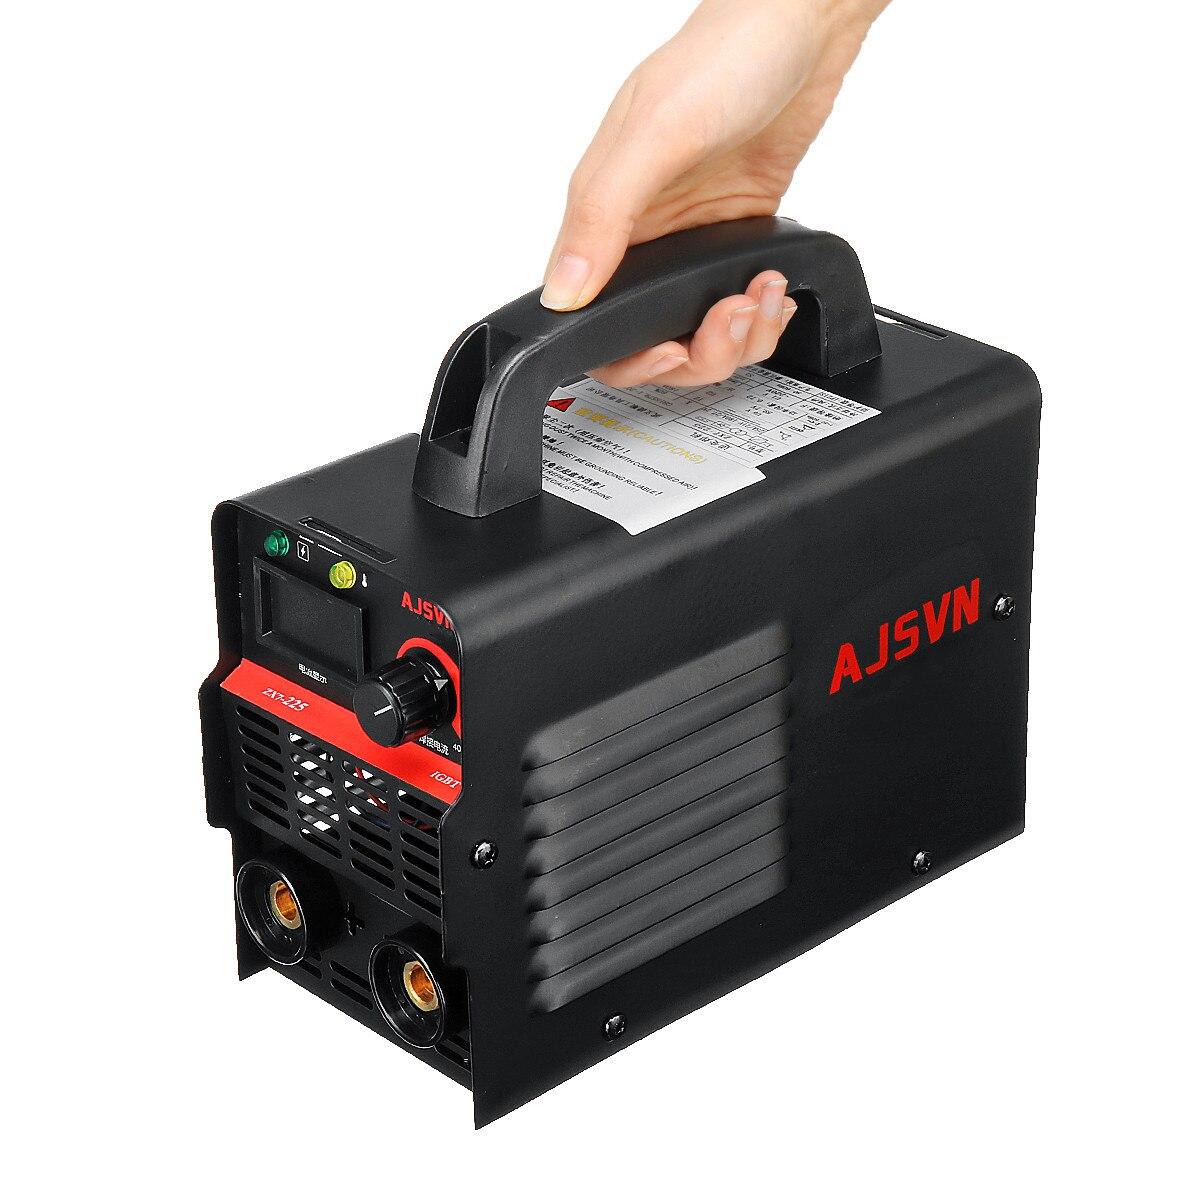 New 220V Adjustable 20A-225A 4200W Handheld IGBT Inverter Arc Welder-Welding Machine Digital Display Mini Portable Welding Tool